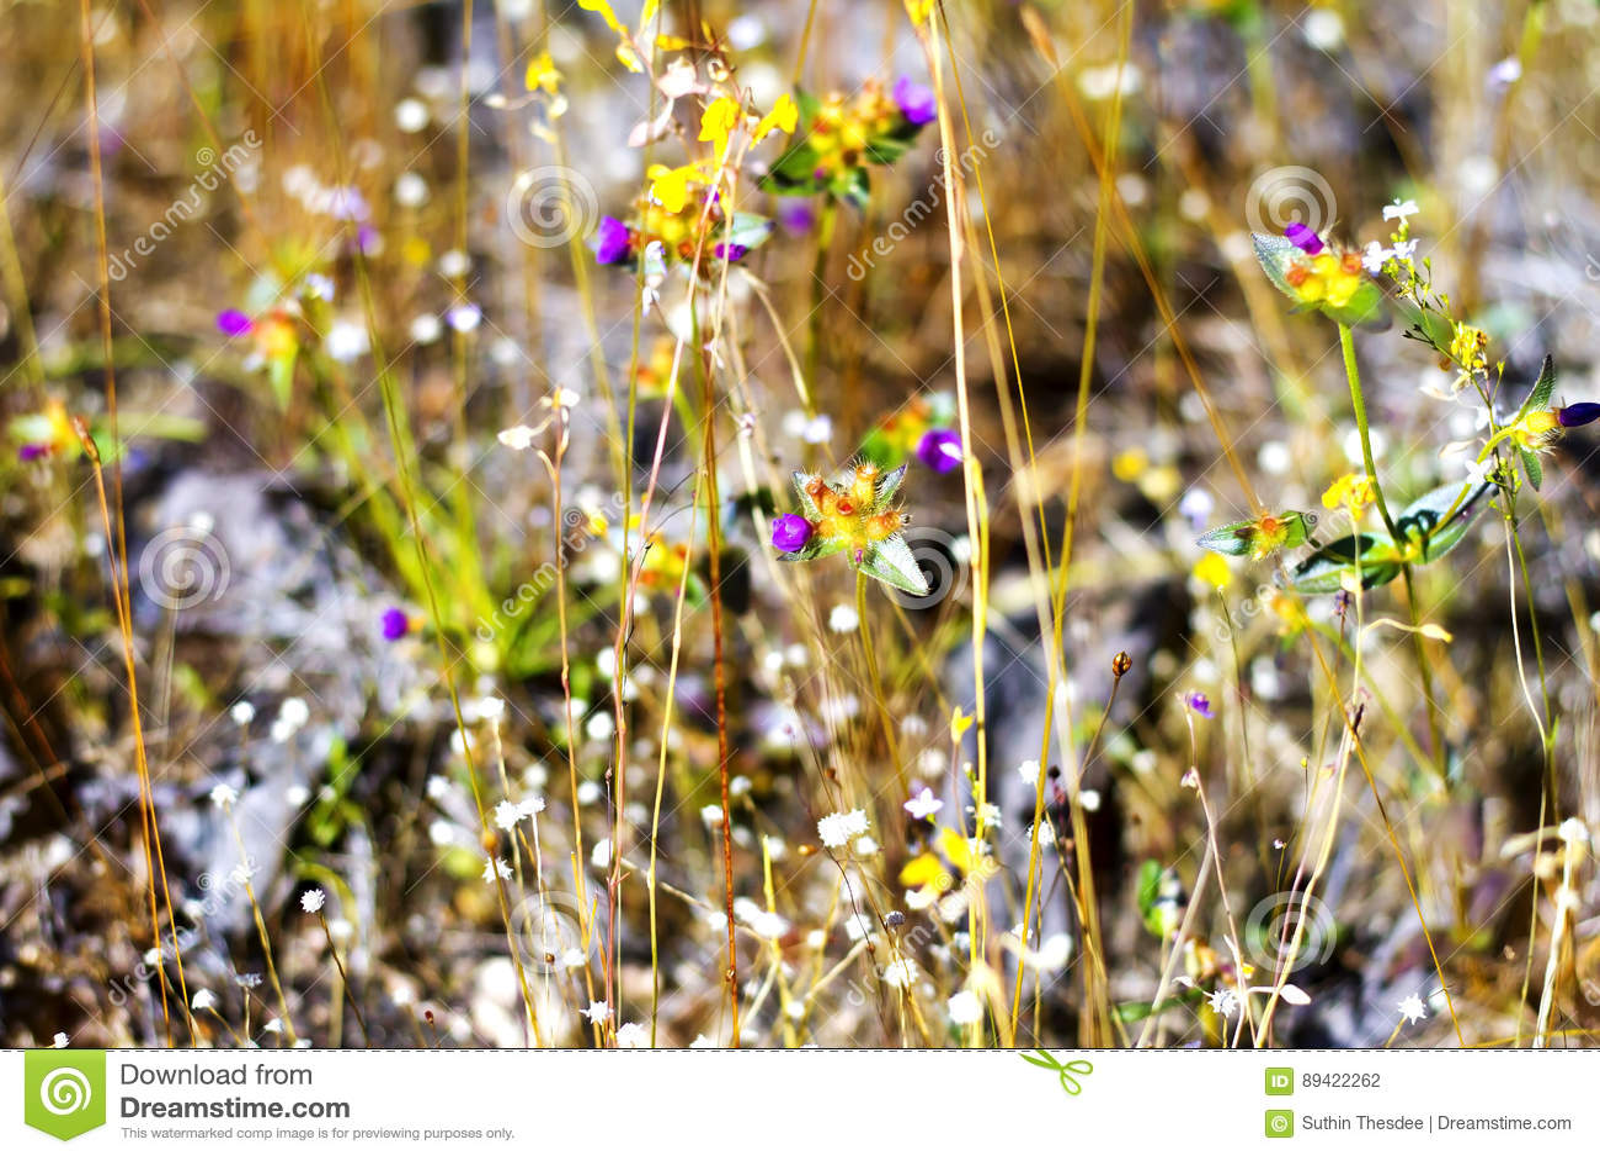 Burmania-coelestris mit trockenem Gras